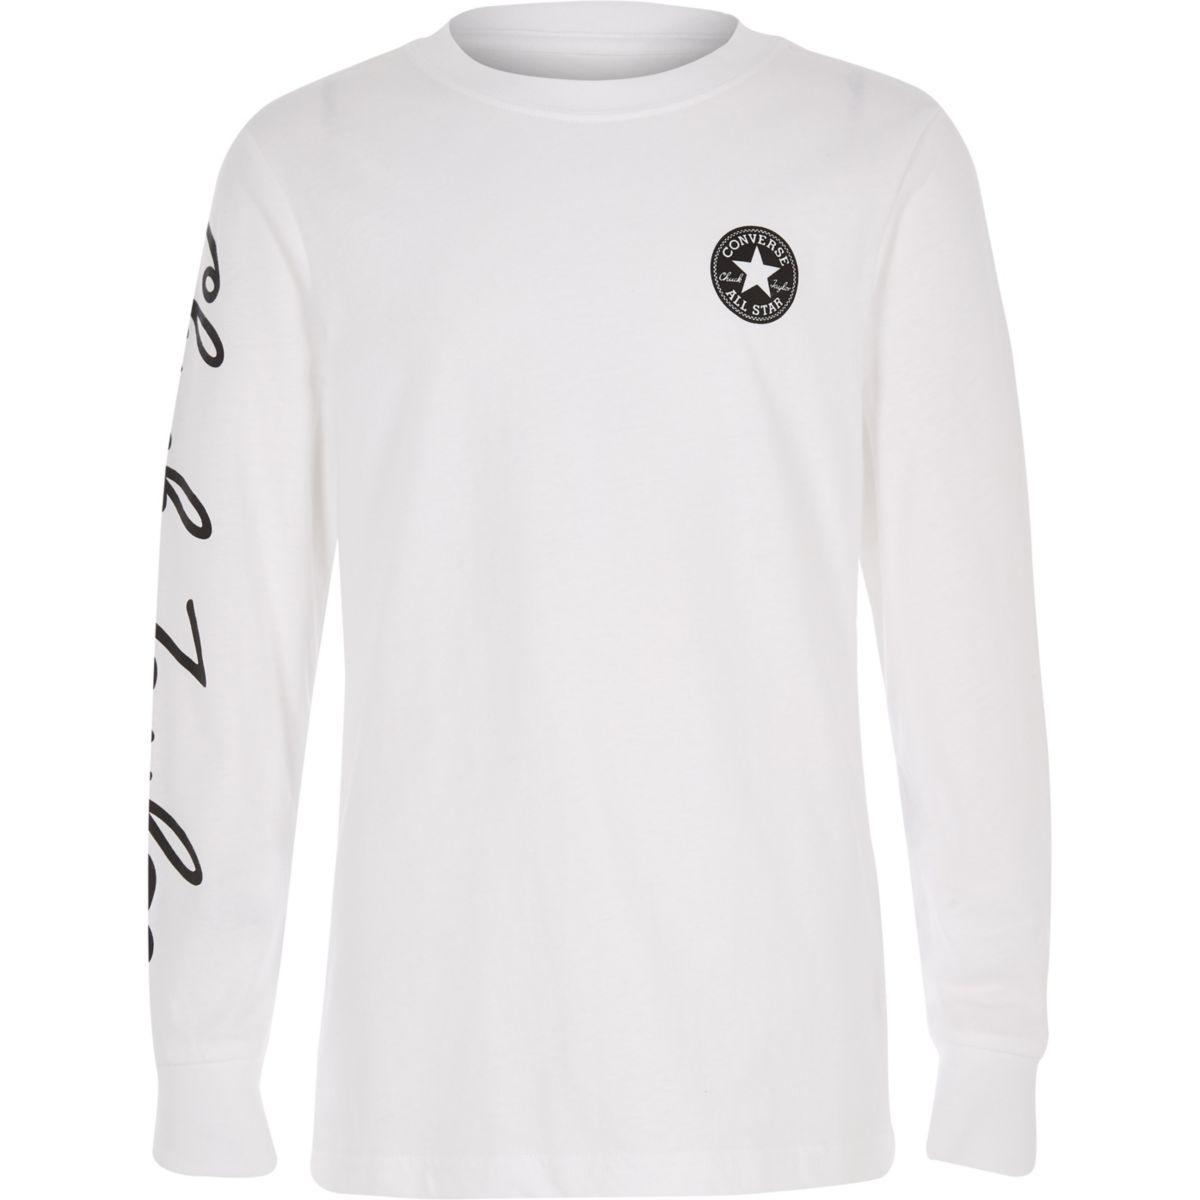 Boys Converse white long sleeve T-shirt